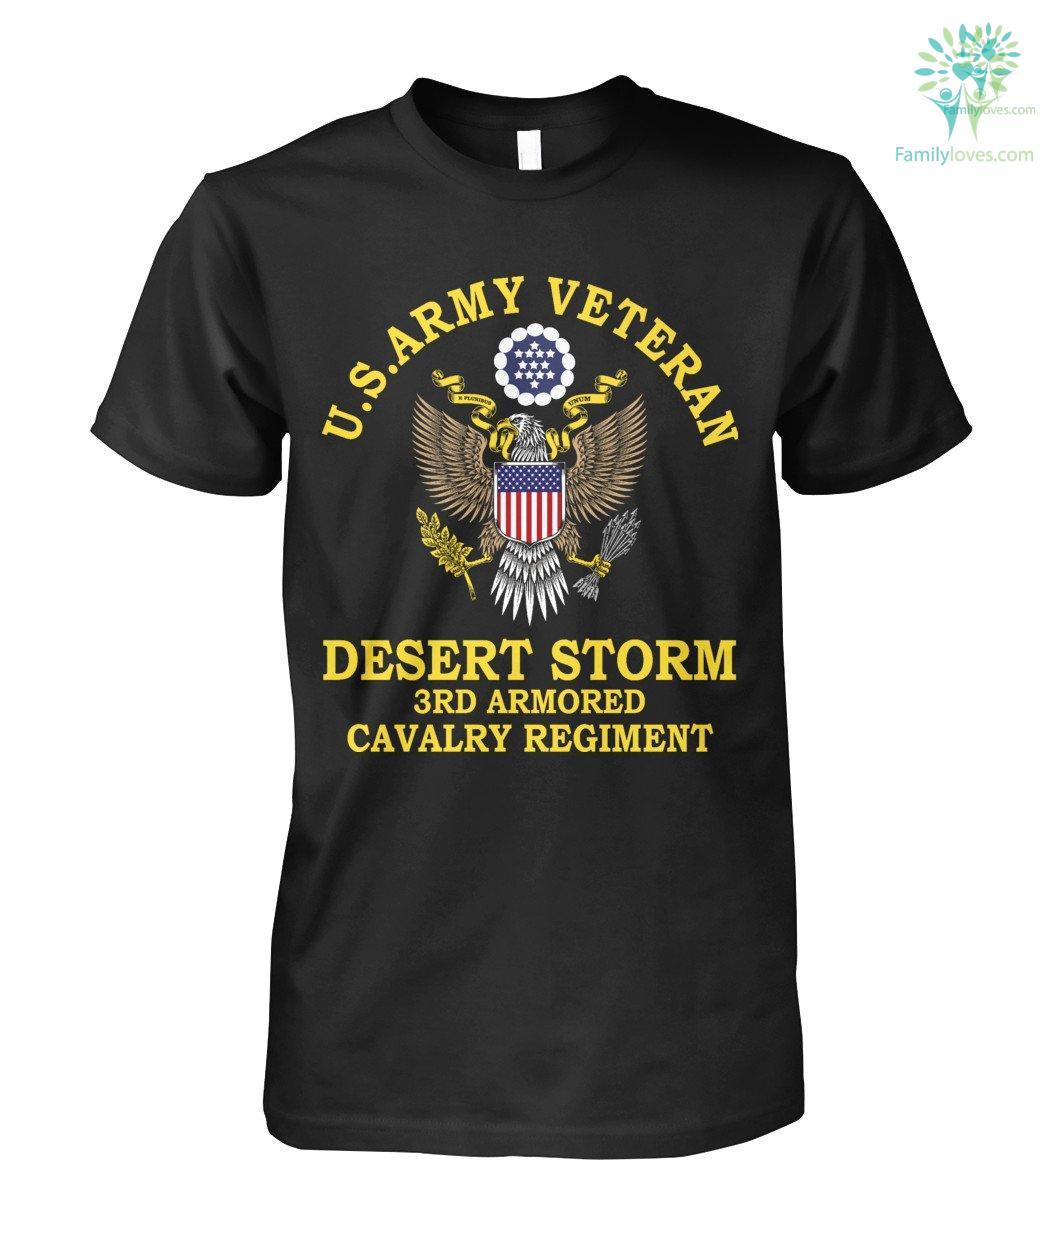 U.s.army veteran desert storm 3rd armored cavalry regiment? t-shirt Familyloves.com